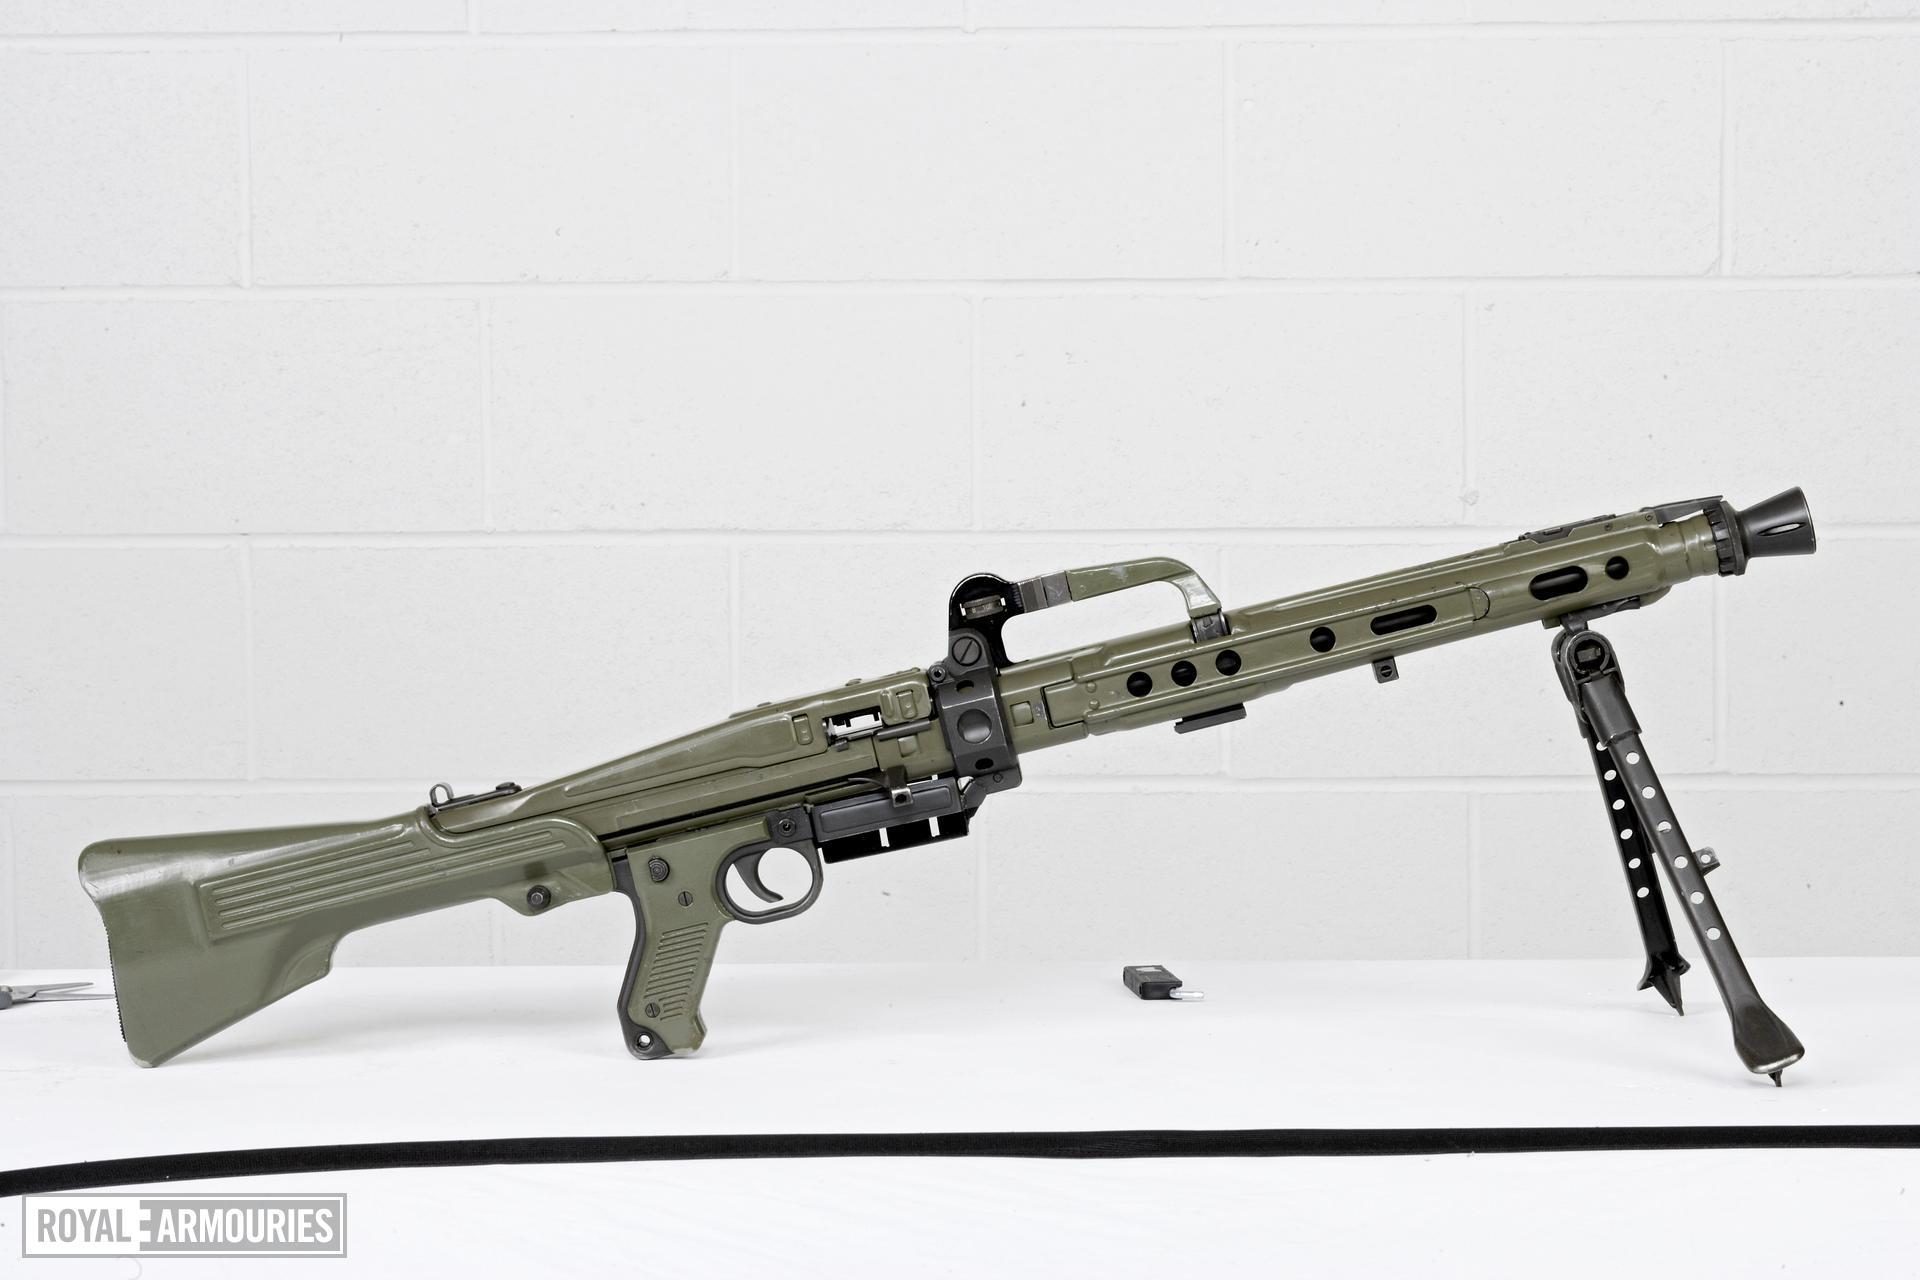 Centrefire automatic machine gun - CETME Ameli